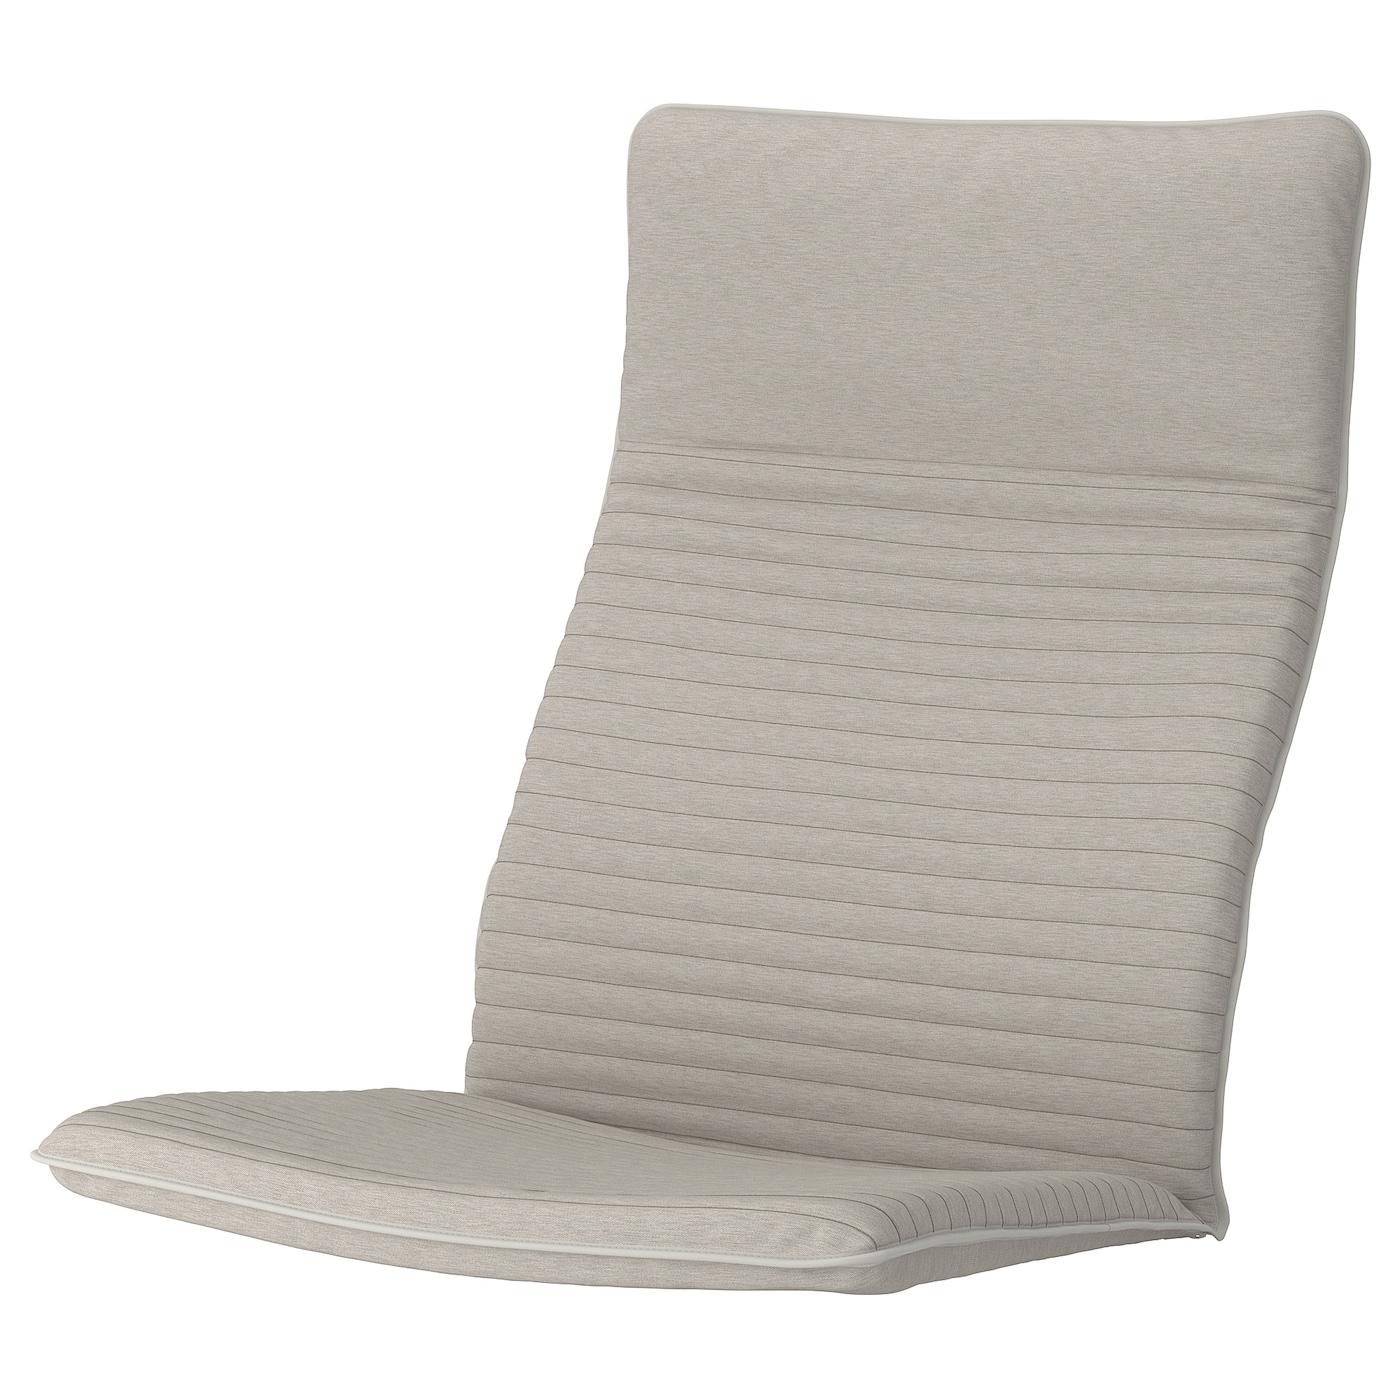 POÄNG Coussin fauteuil, Knisa beige clair IKEA